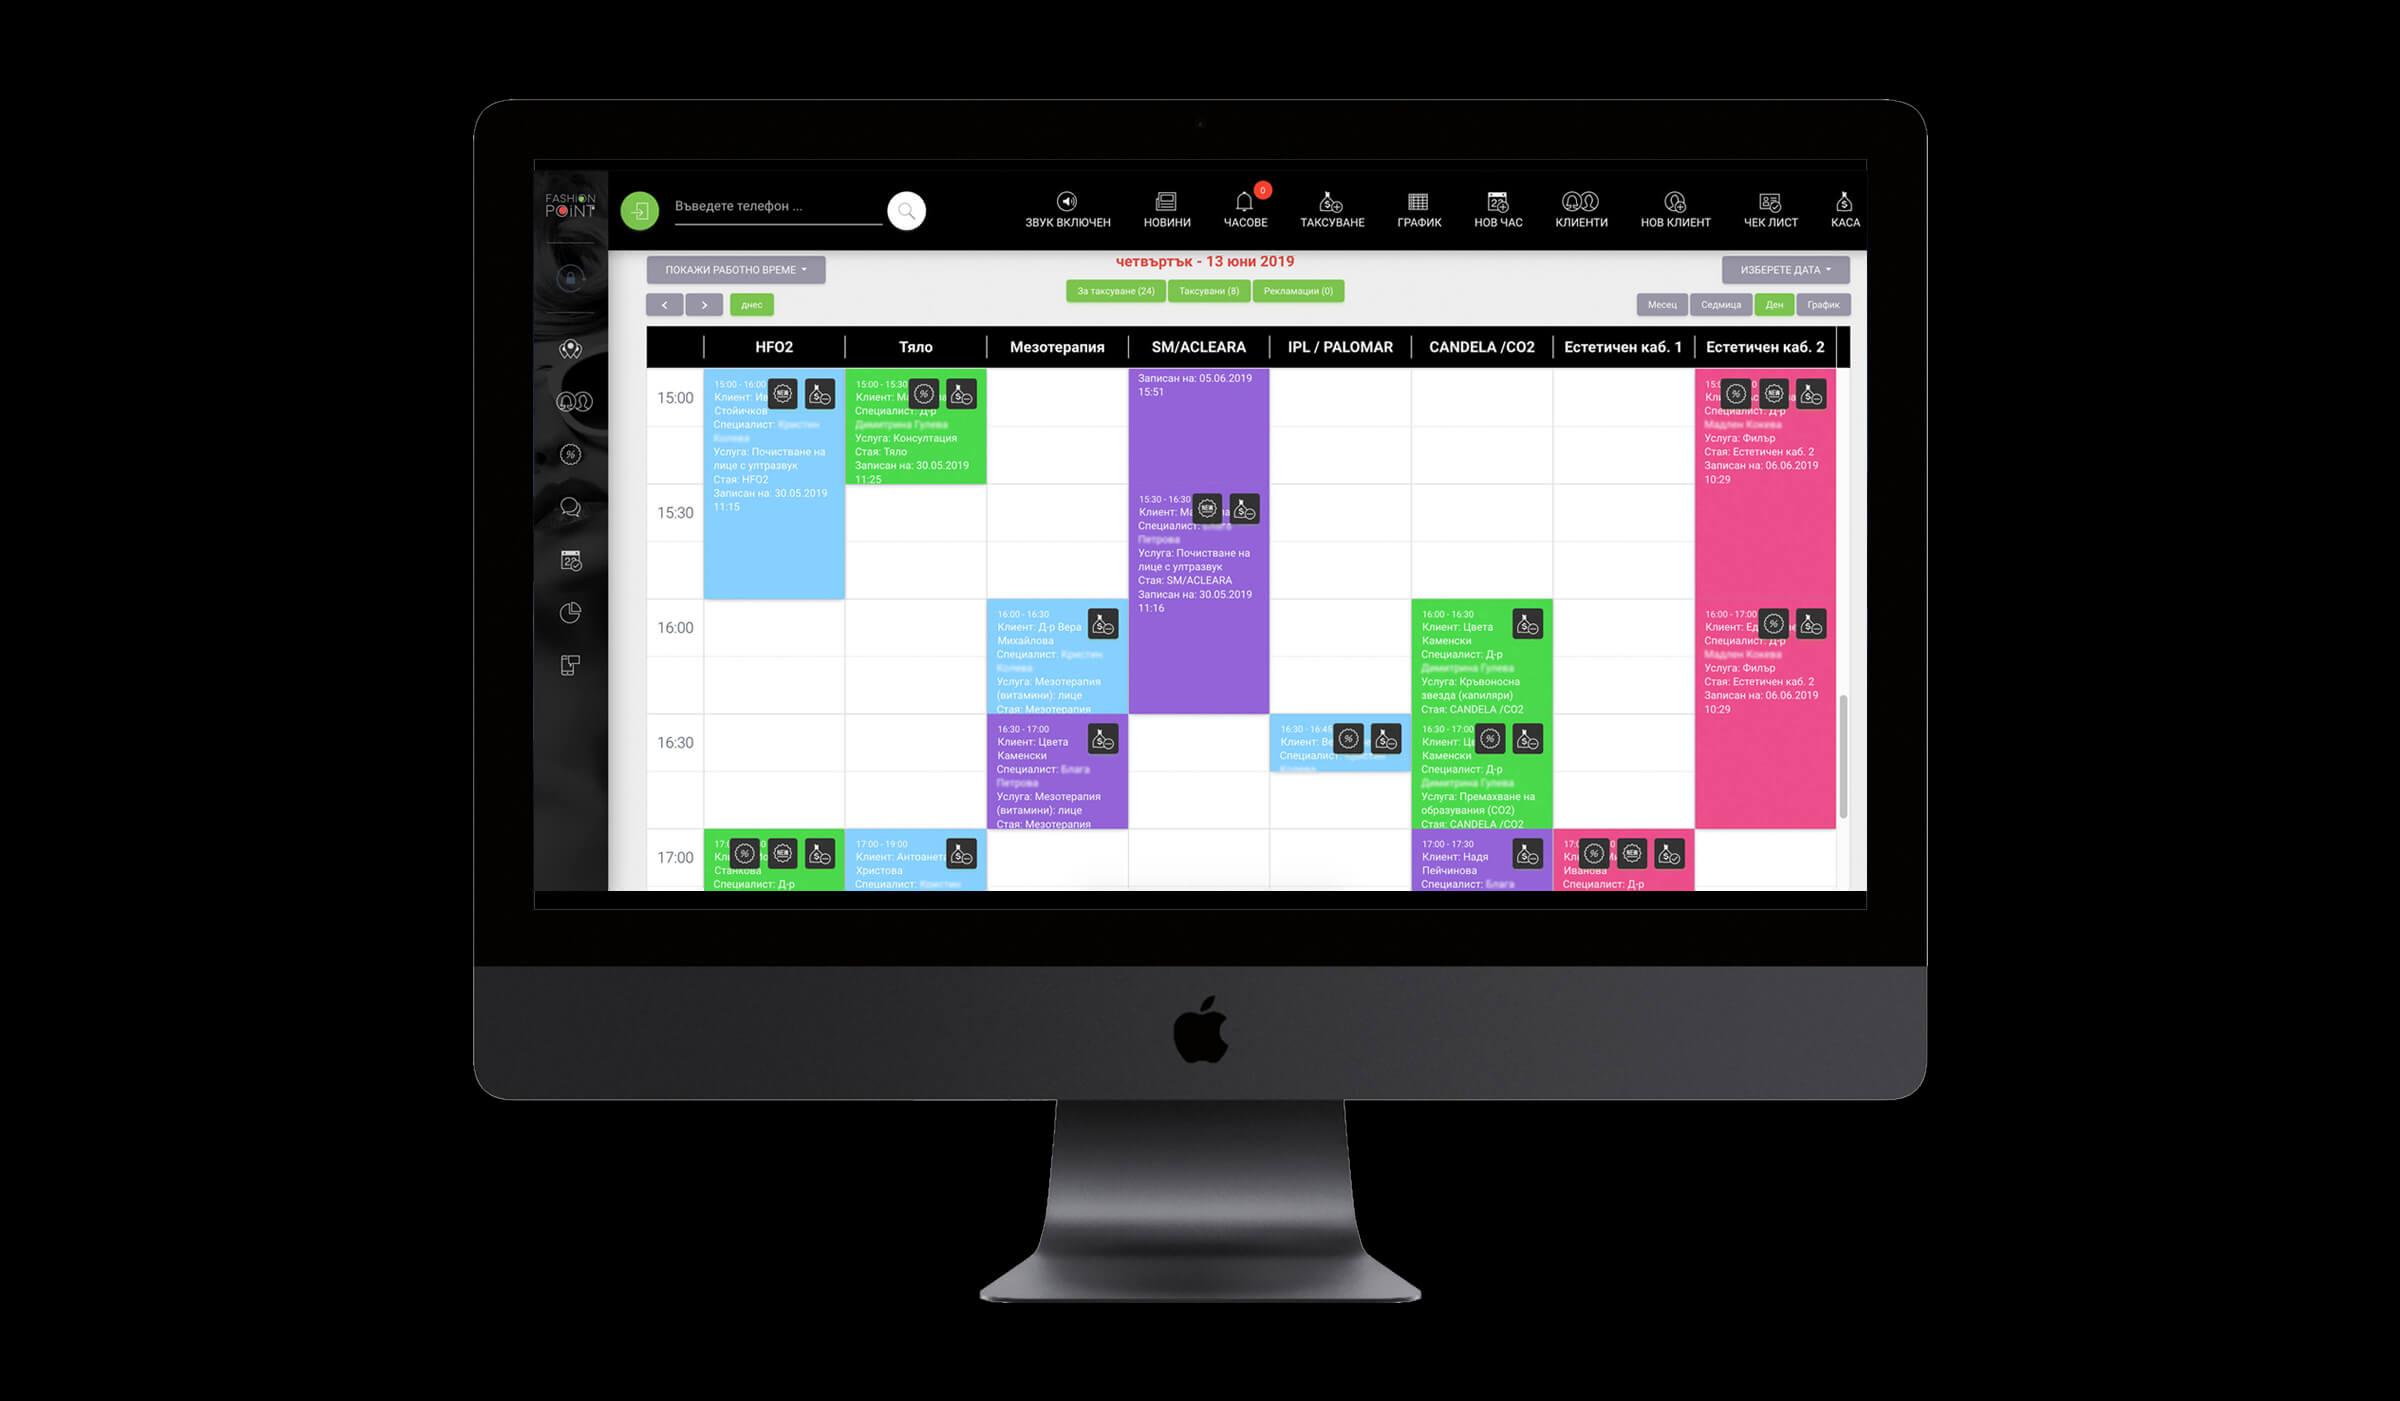 Резервации в дневния календар сортирани по кабинети